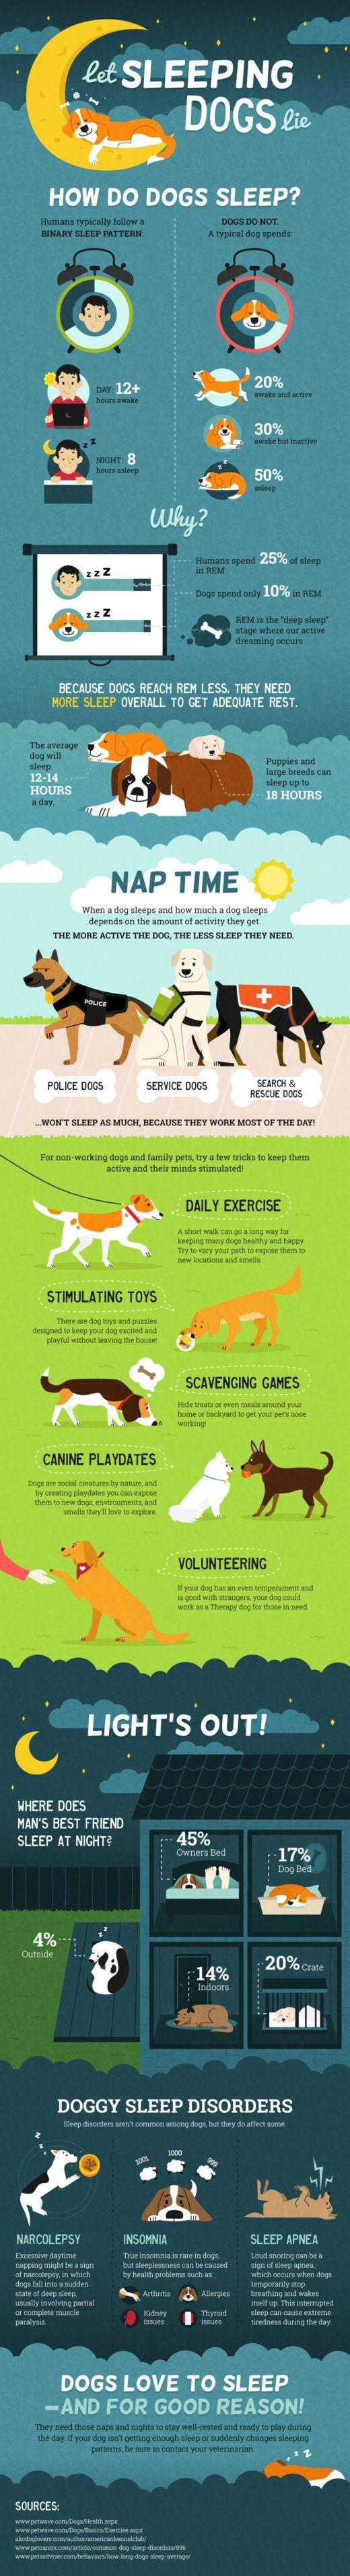 Dog sleep patterns